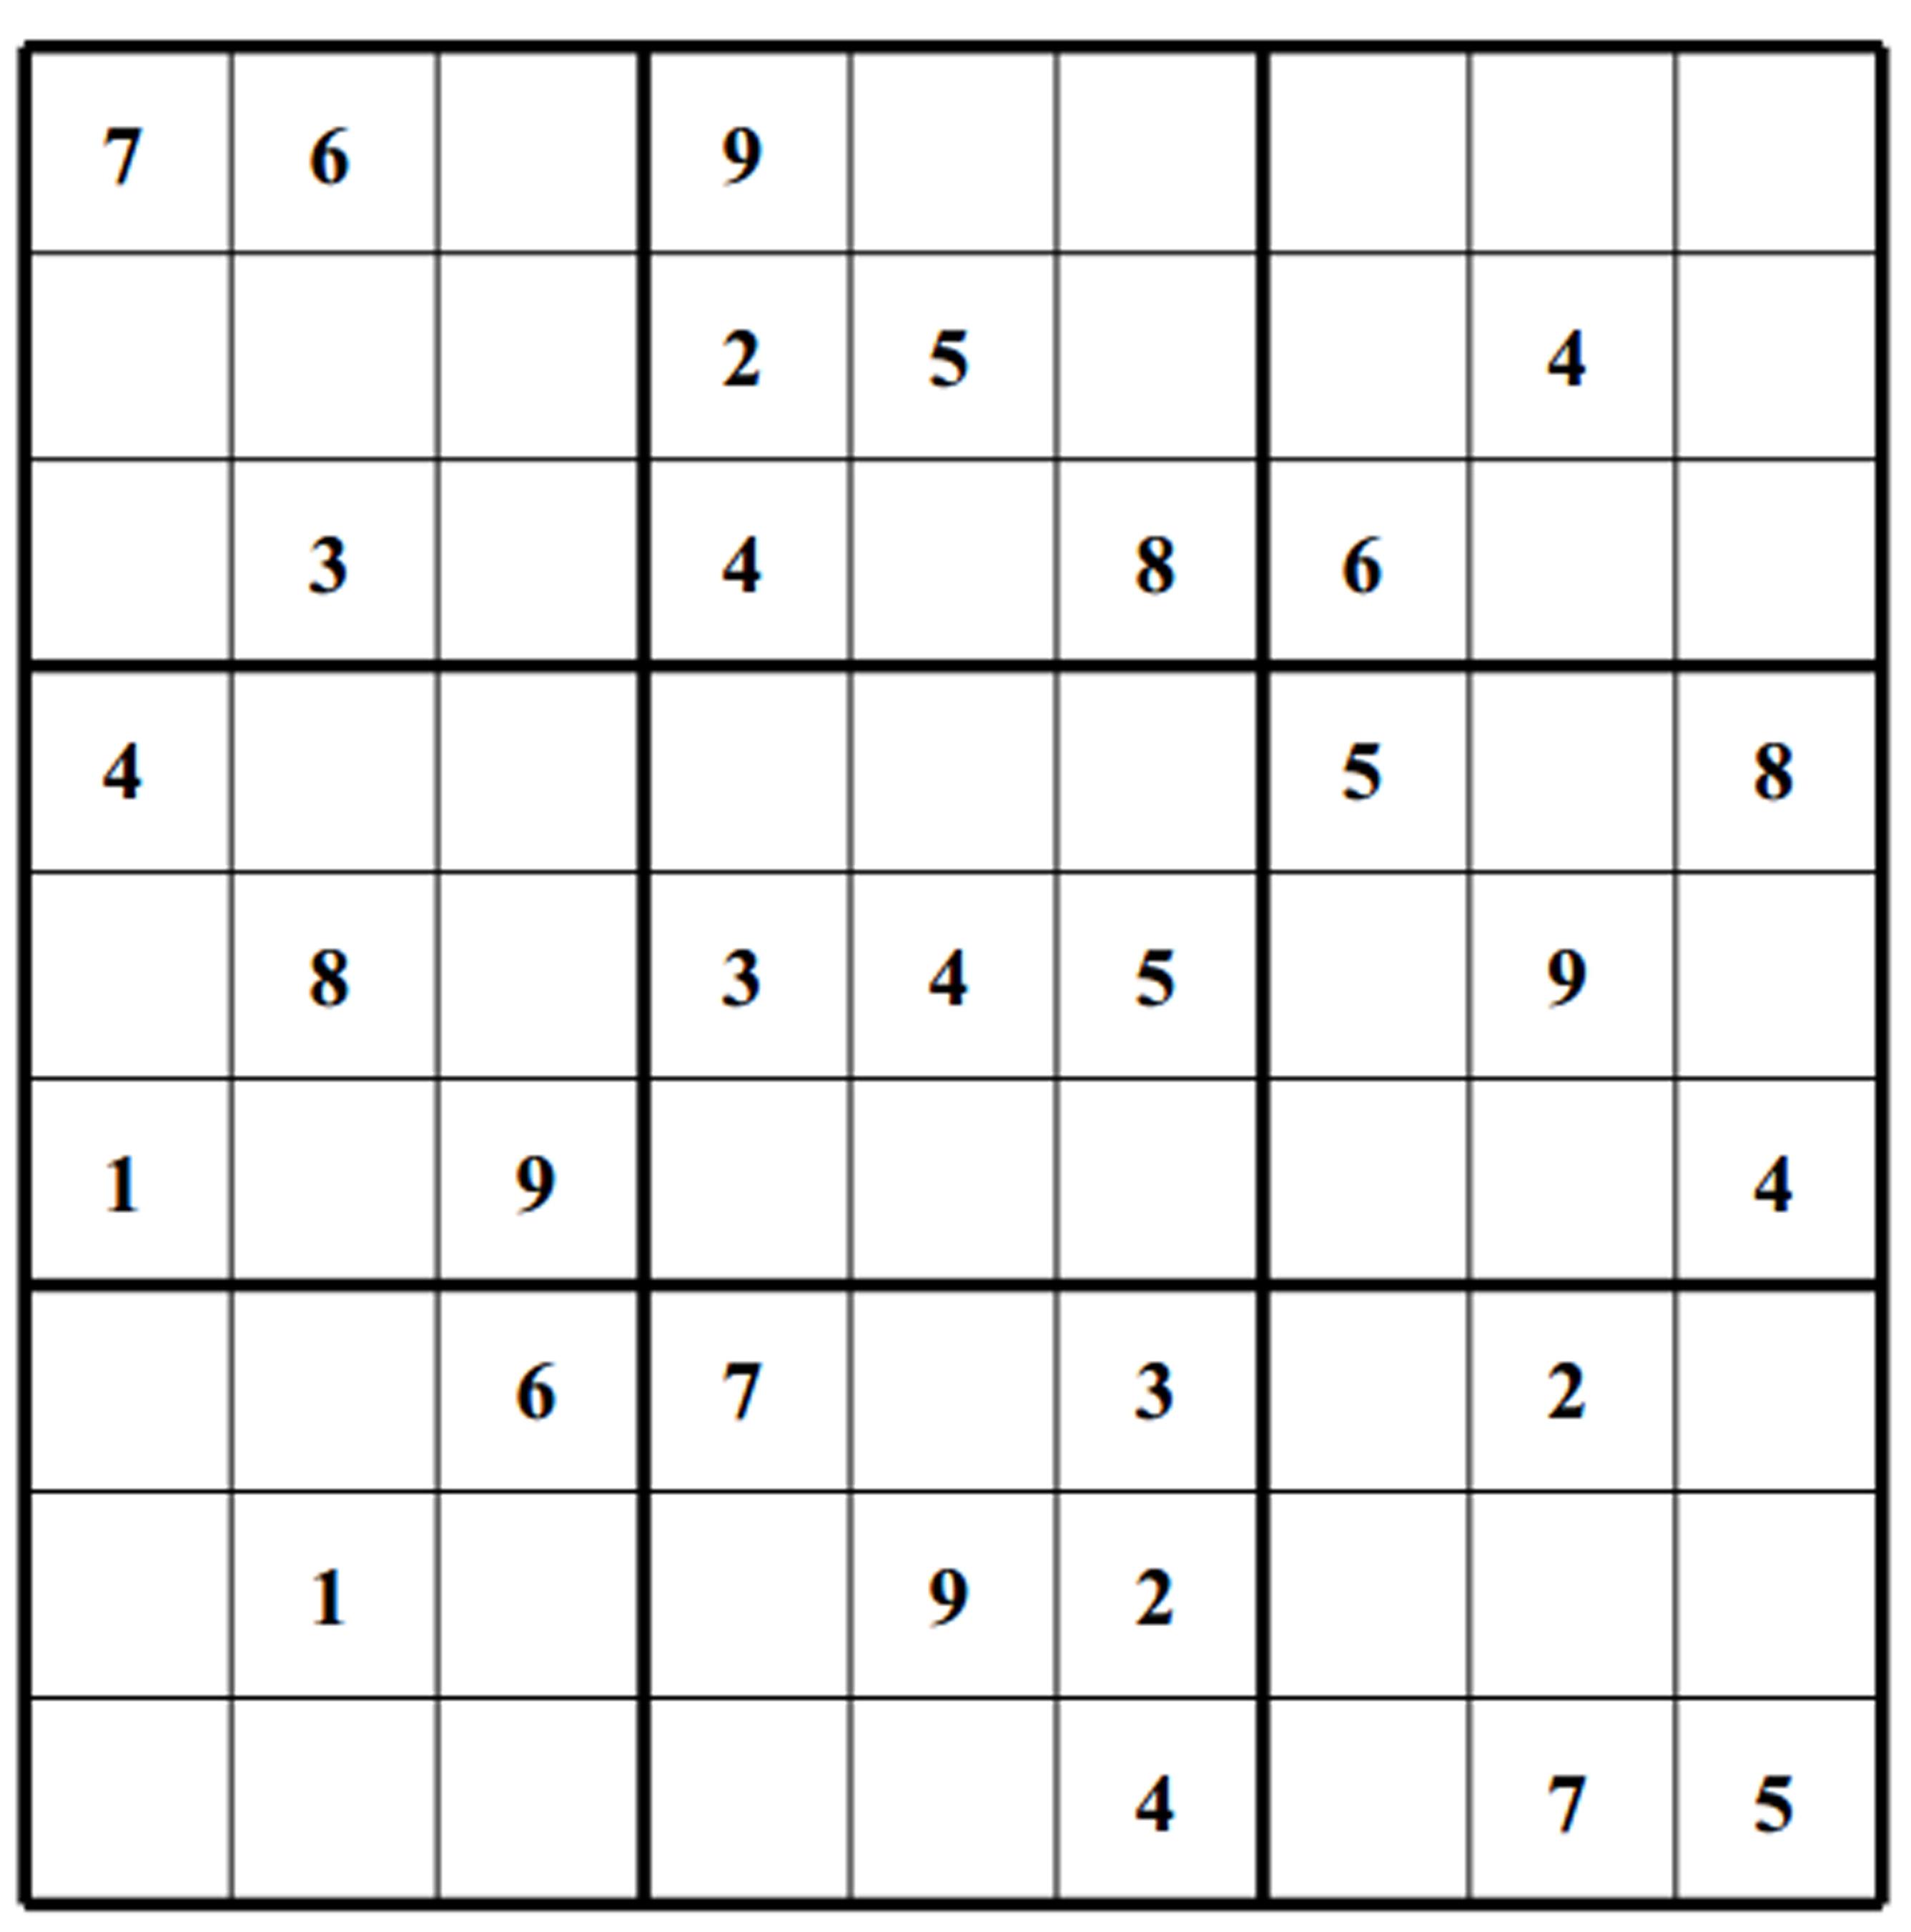 Free Sudoku Puzzles | Enjoy Daily Free Sudoku Puzzles From Walapie - Sudoku X Printable Puzzles